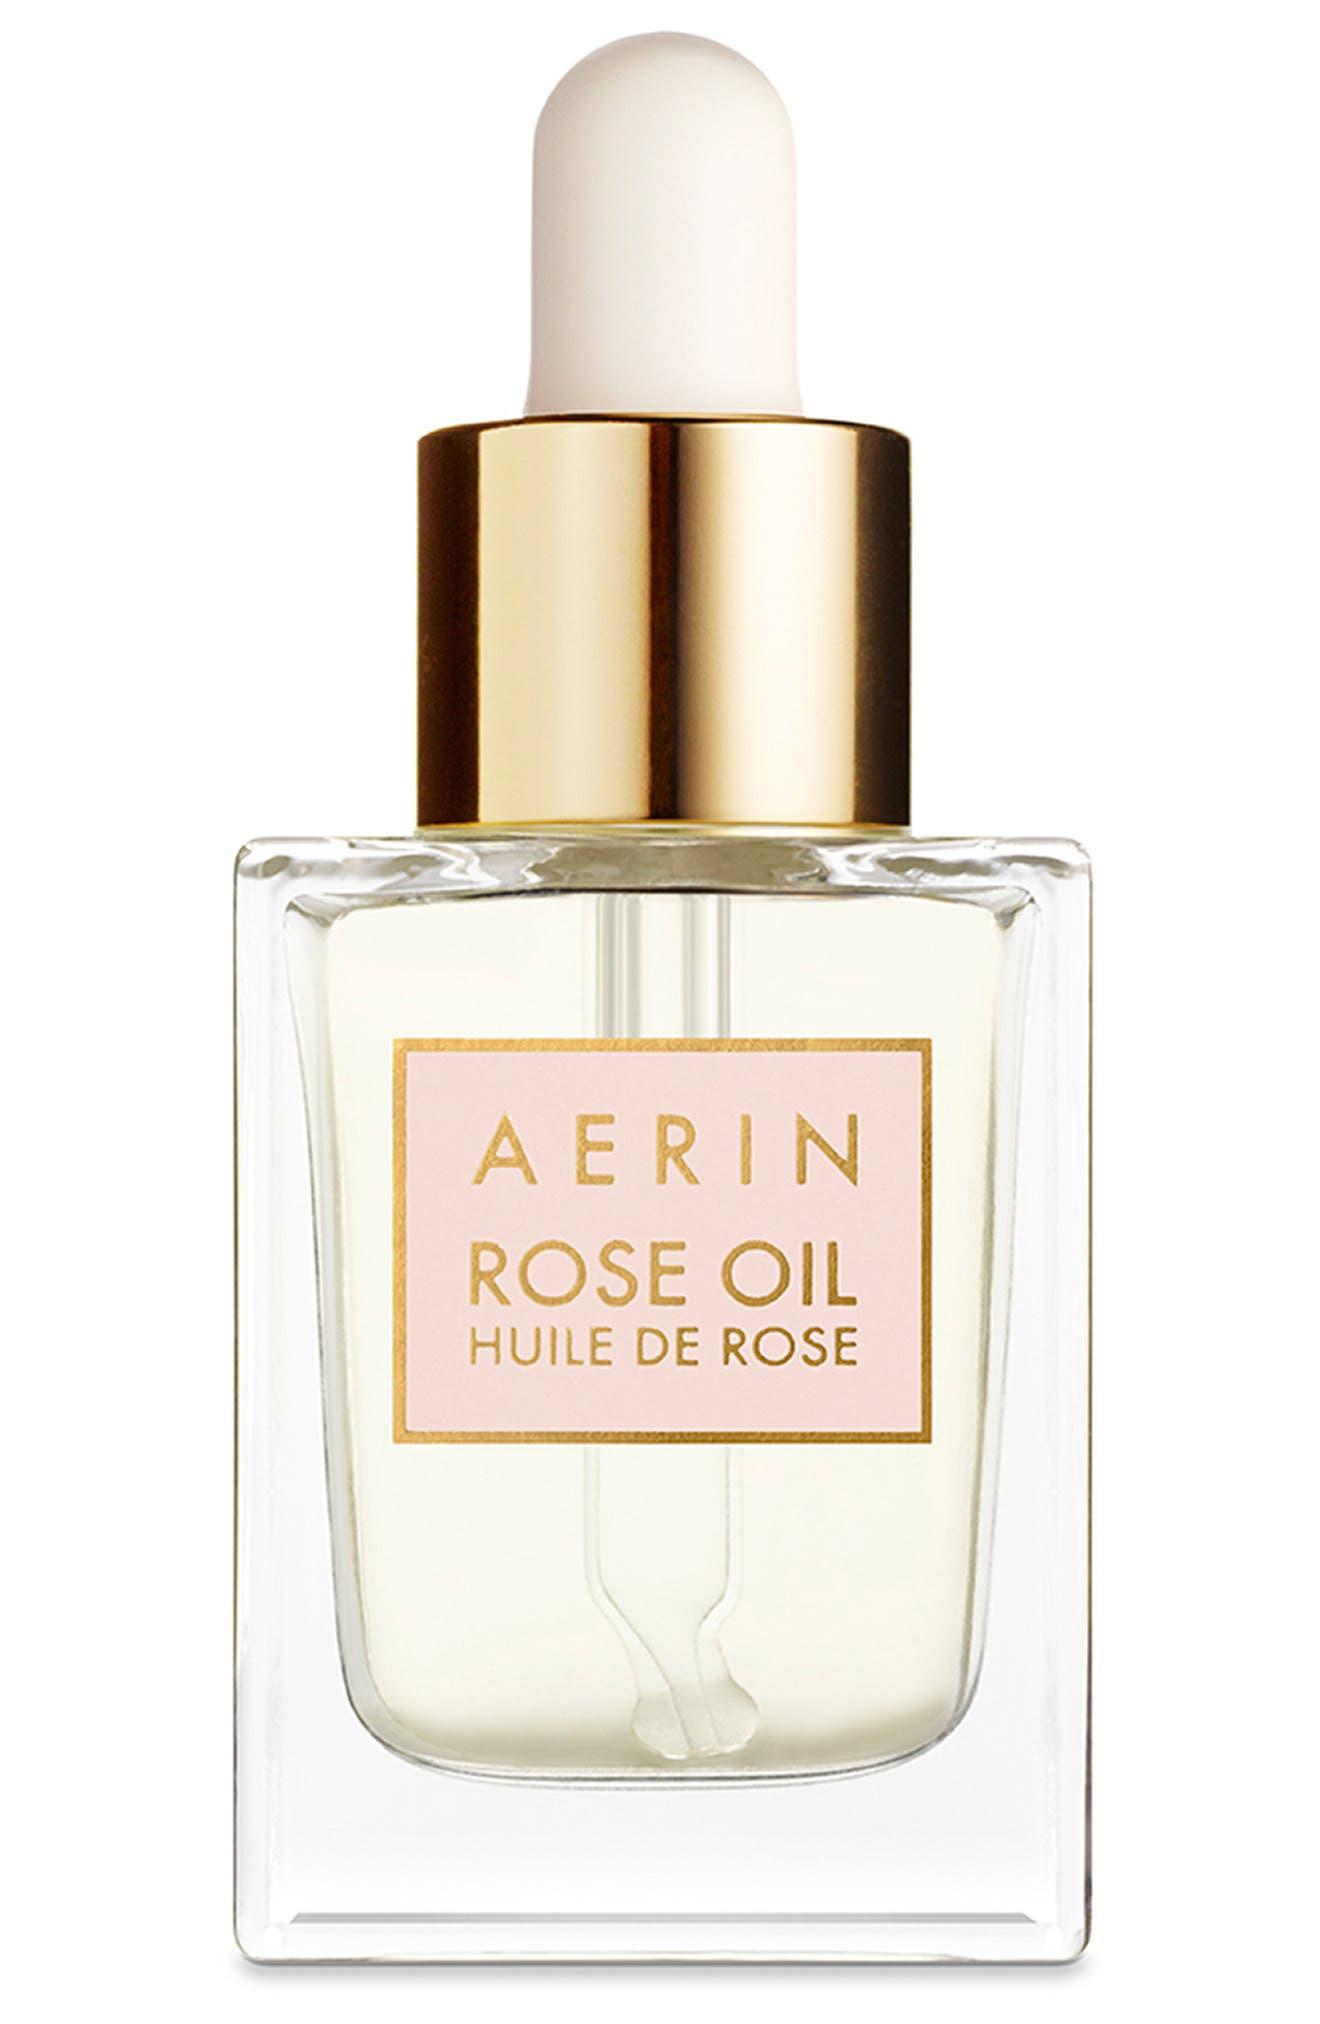 AERIN Beauty Rose Oil,                         Main,                         color, No Color